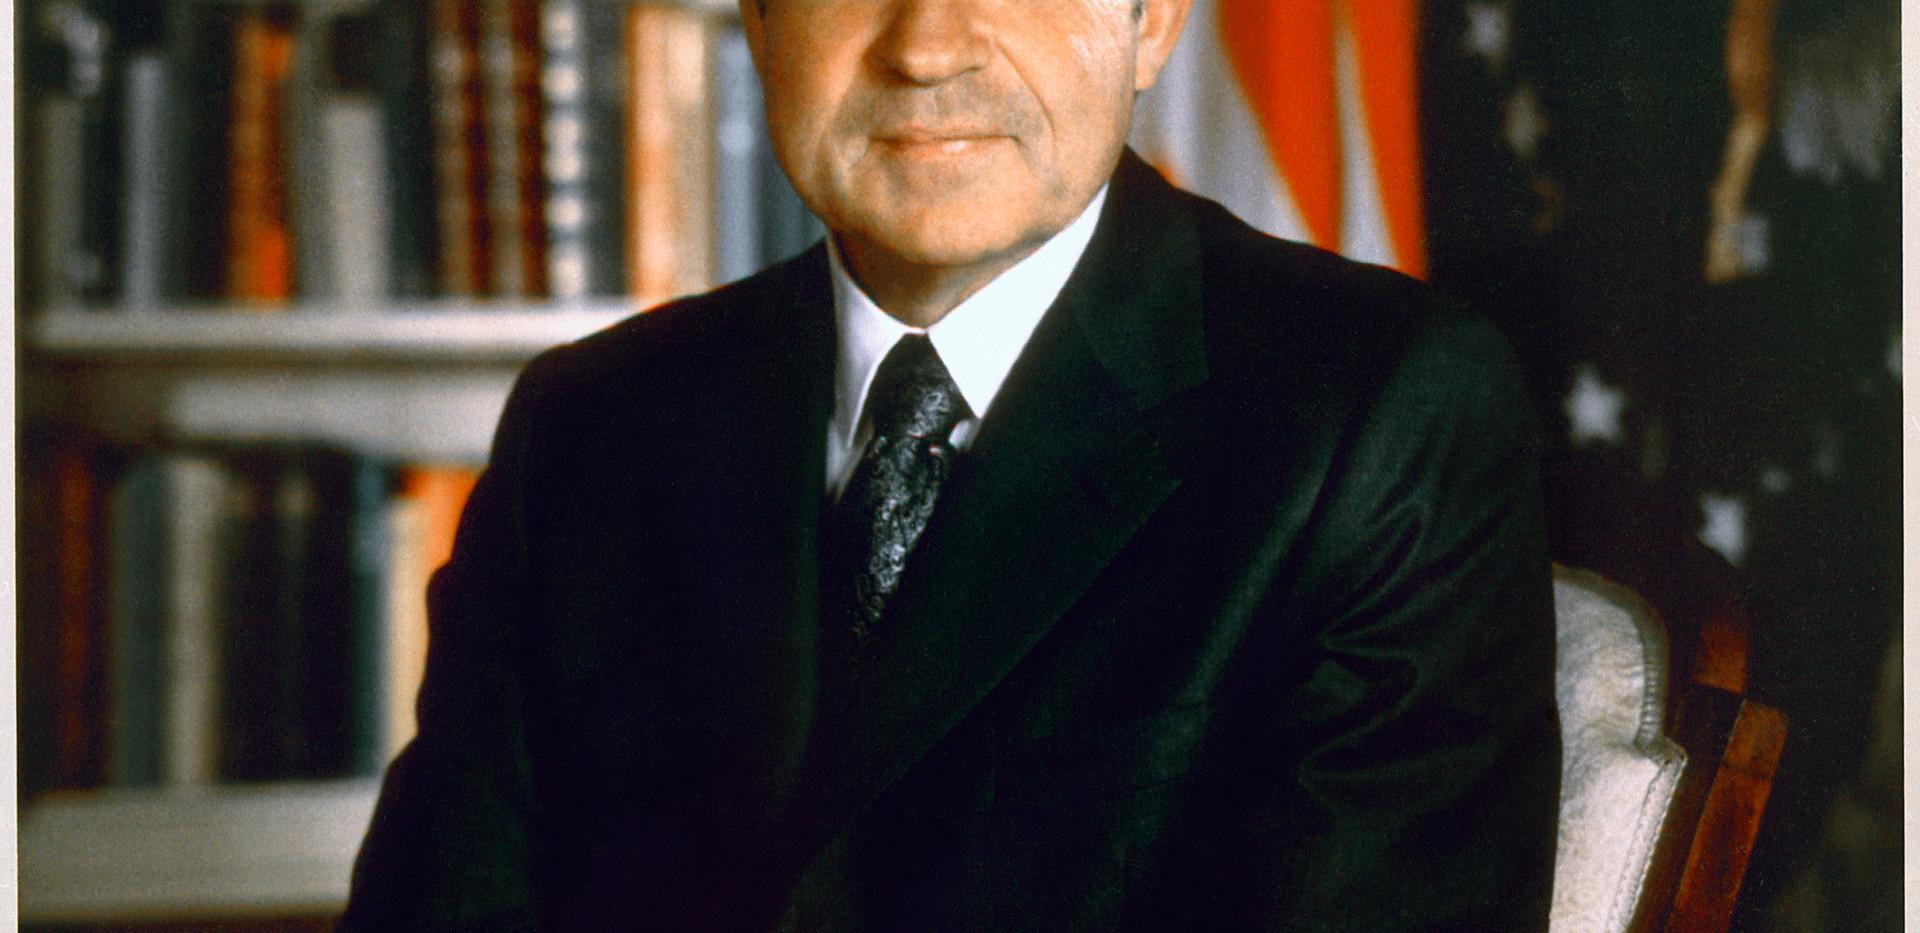 Richard Nixon's official presidential portait